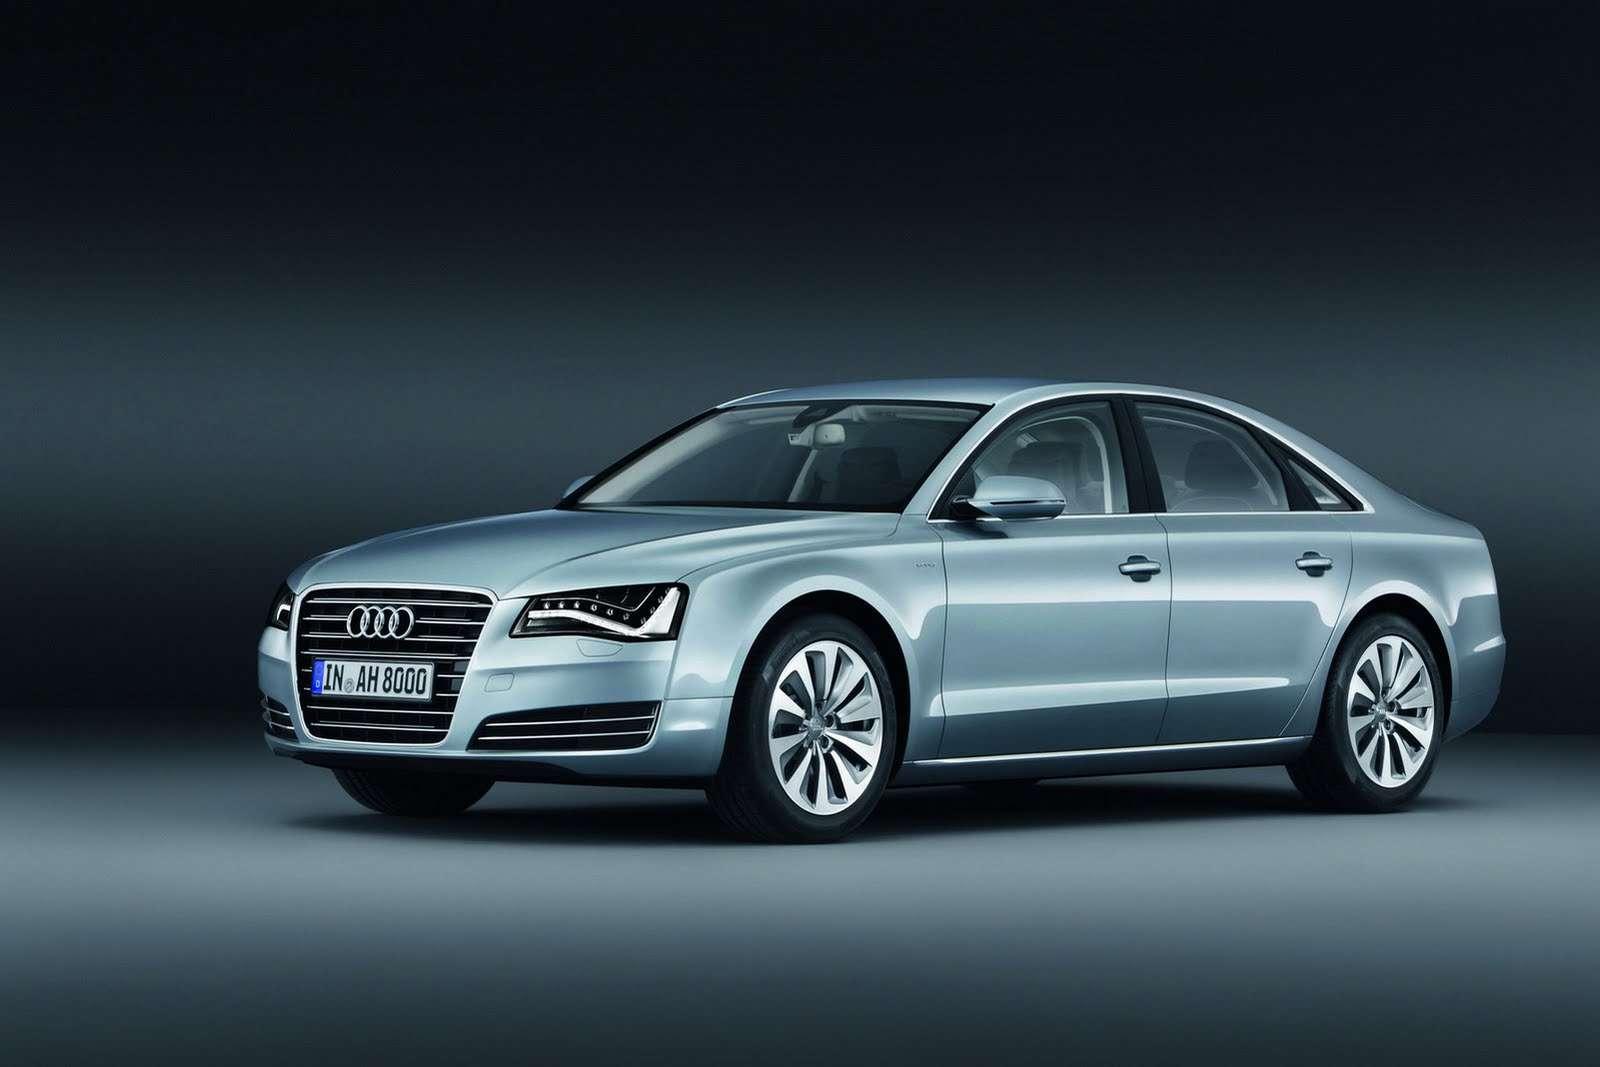 Audi A8 hybryd limited i nowy silnik frankfurt wrzesien 2011